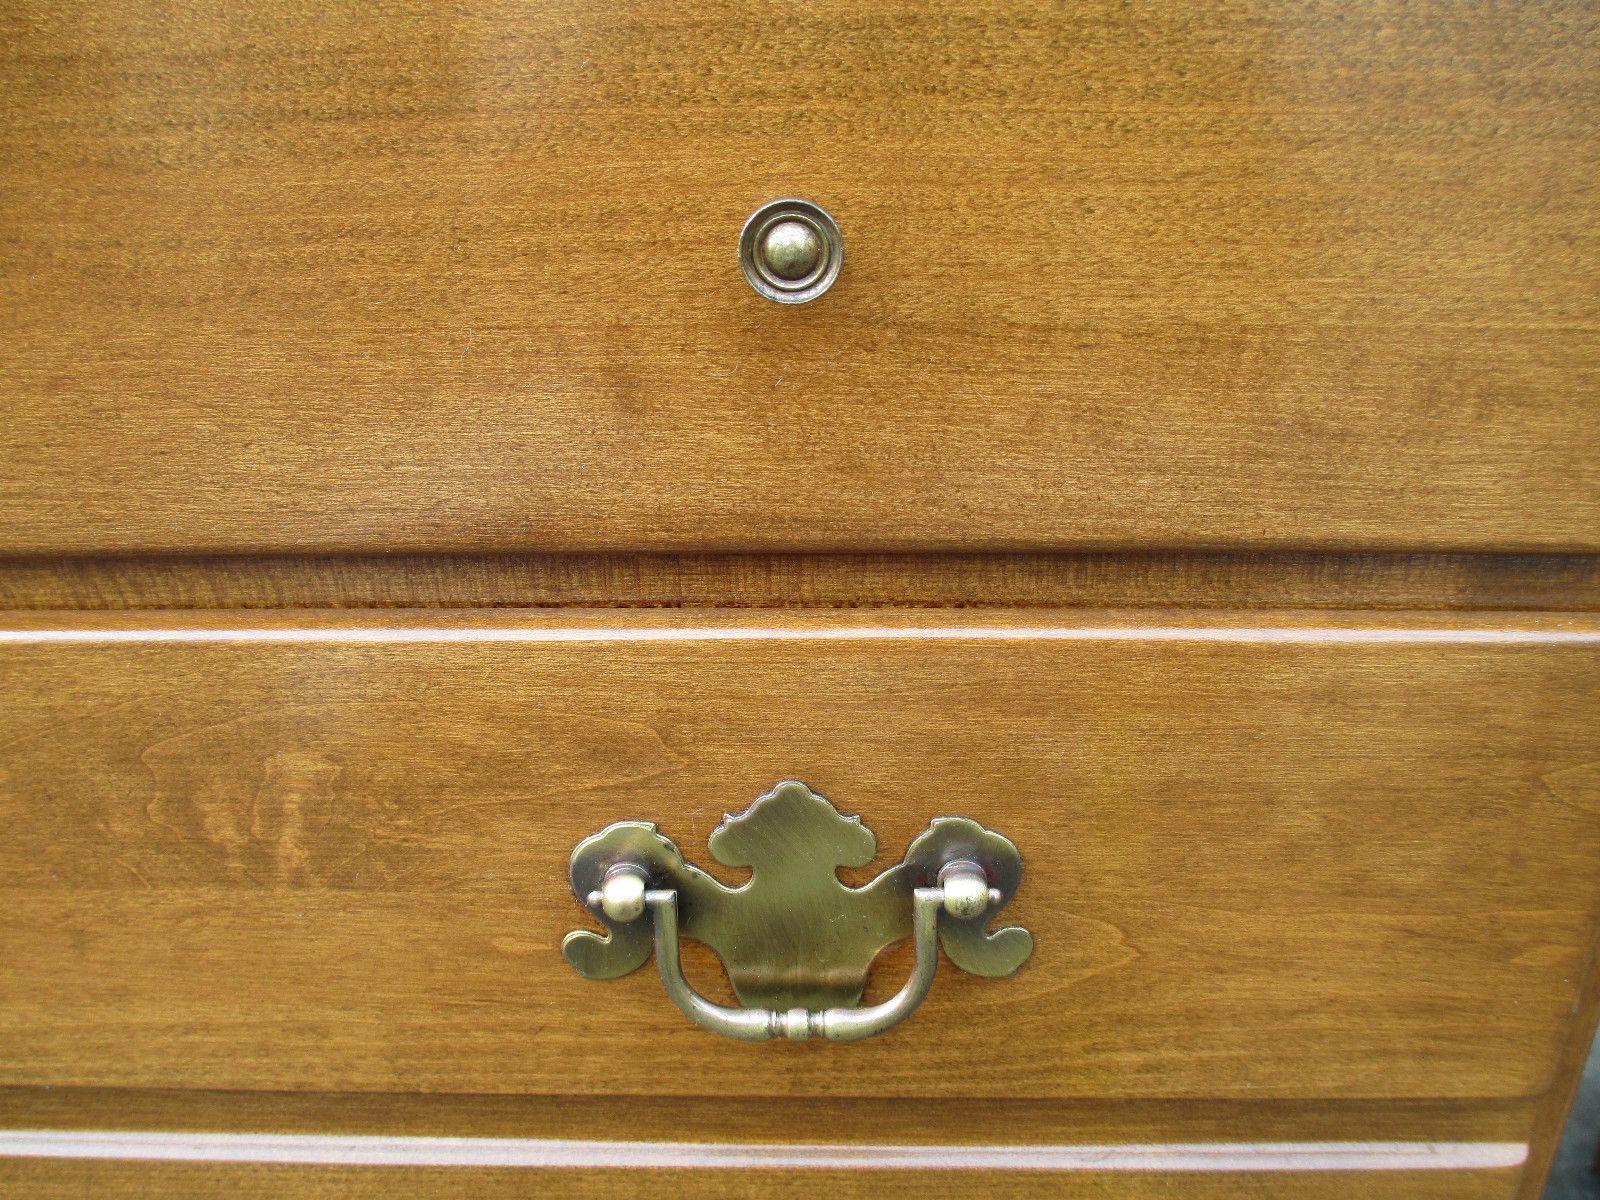 Both Standard Pulls On Ethan Allen Heirloom Furniture Maple Furniture Heirloom Furniture Early American Decorating